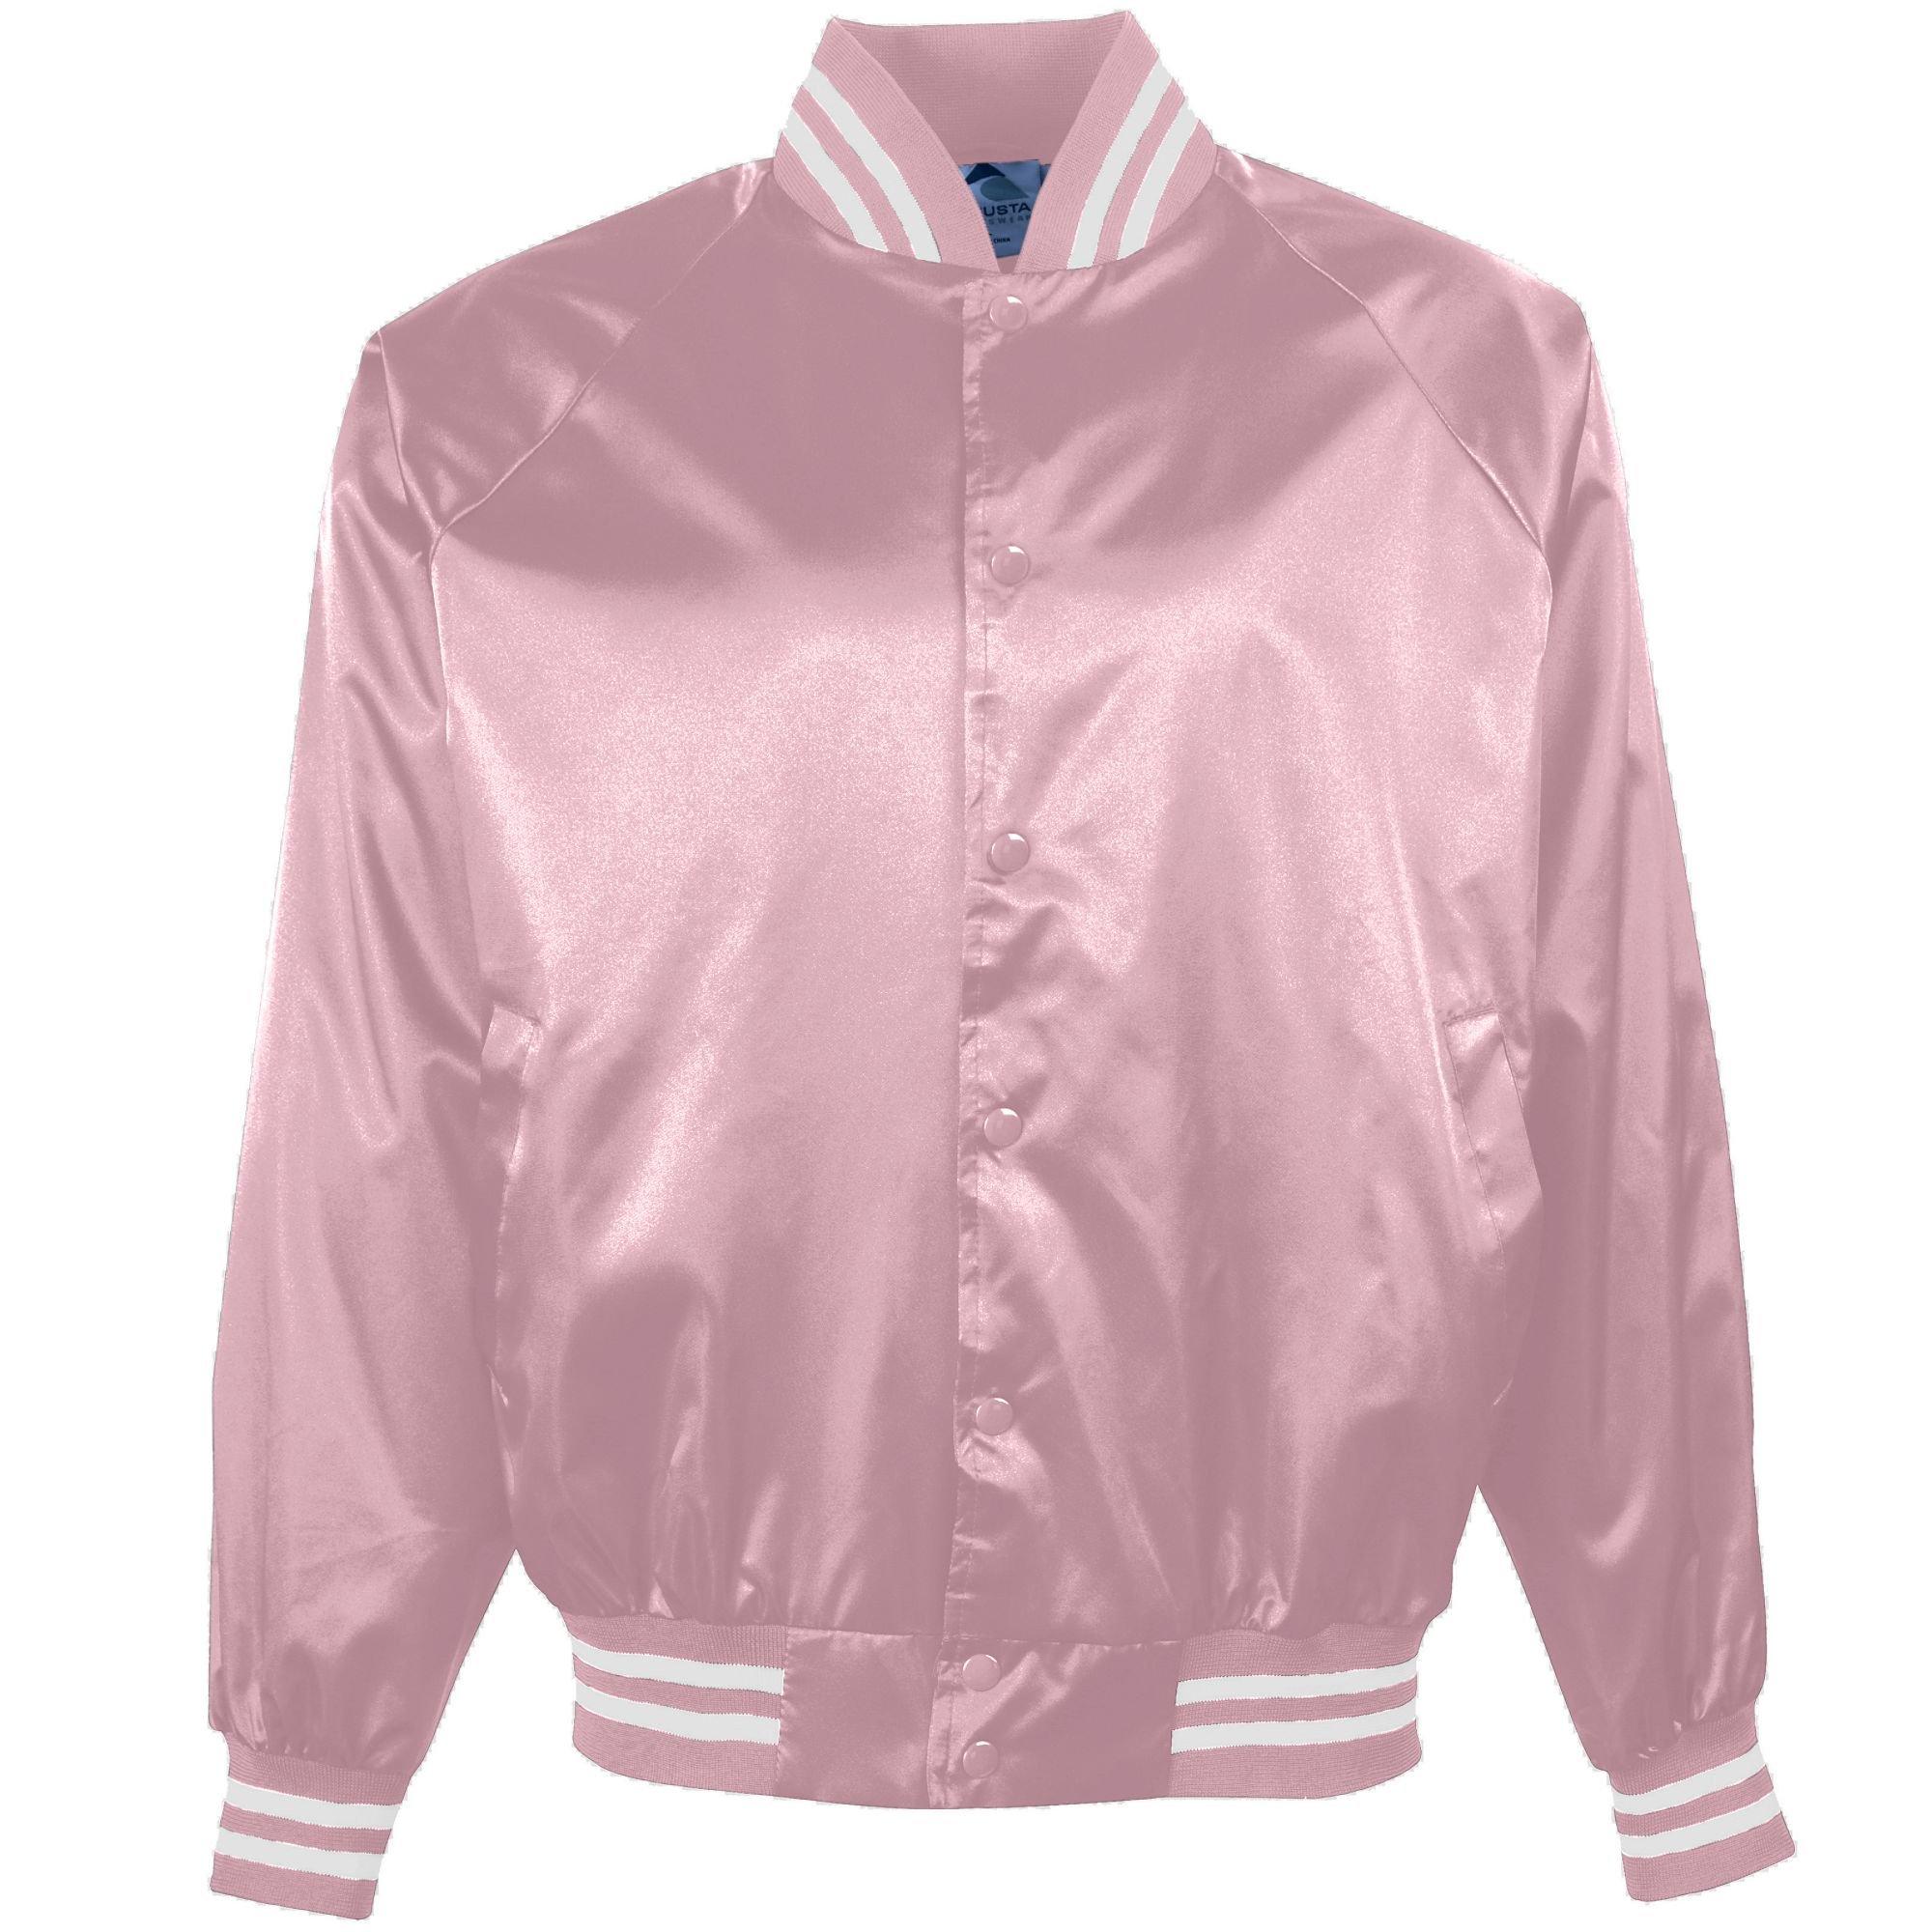 Augusta Sportswear 3610 Men's Satin Baseball Jacket/Striped Trim, Medium, Light Pink/White by Augusta Sportswear